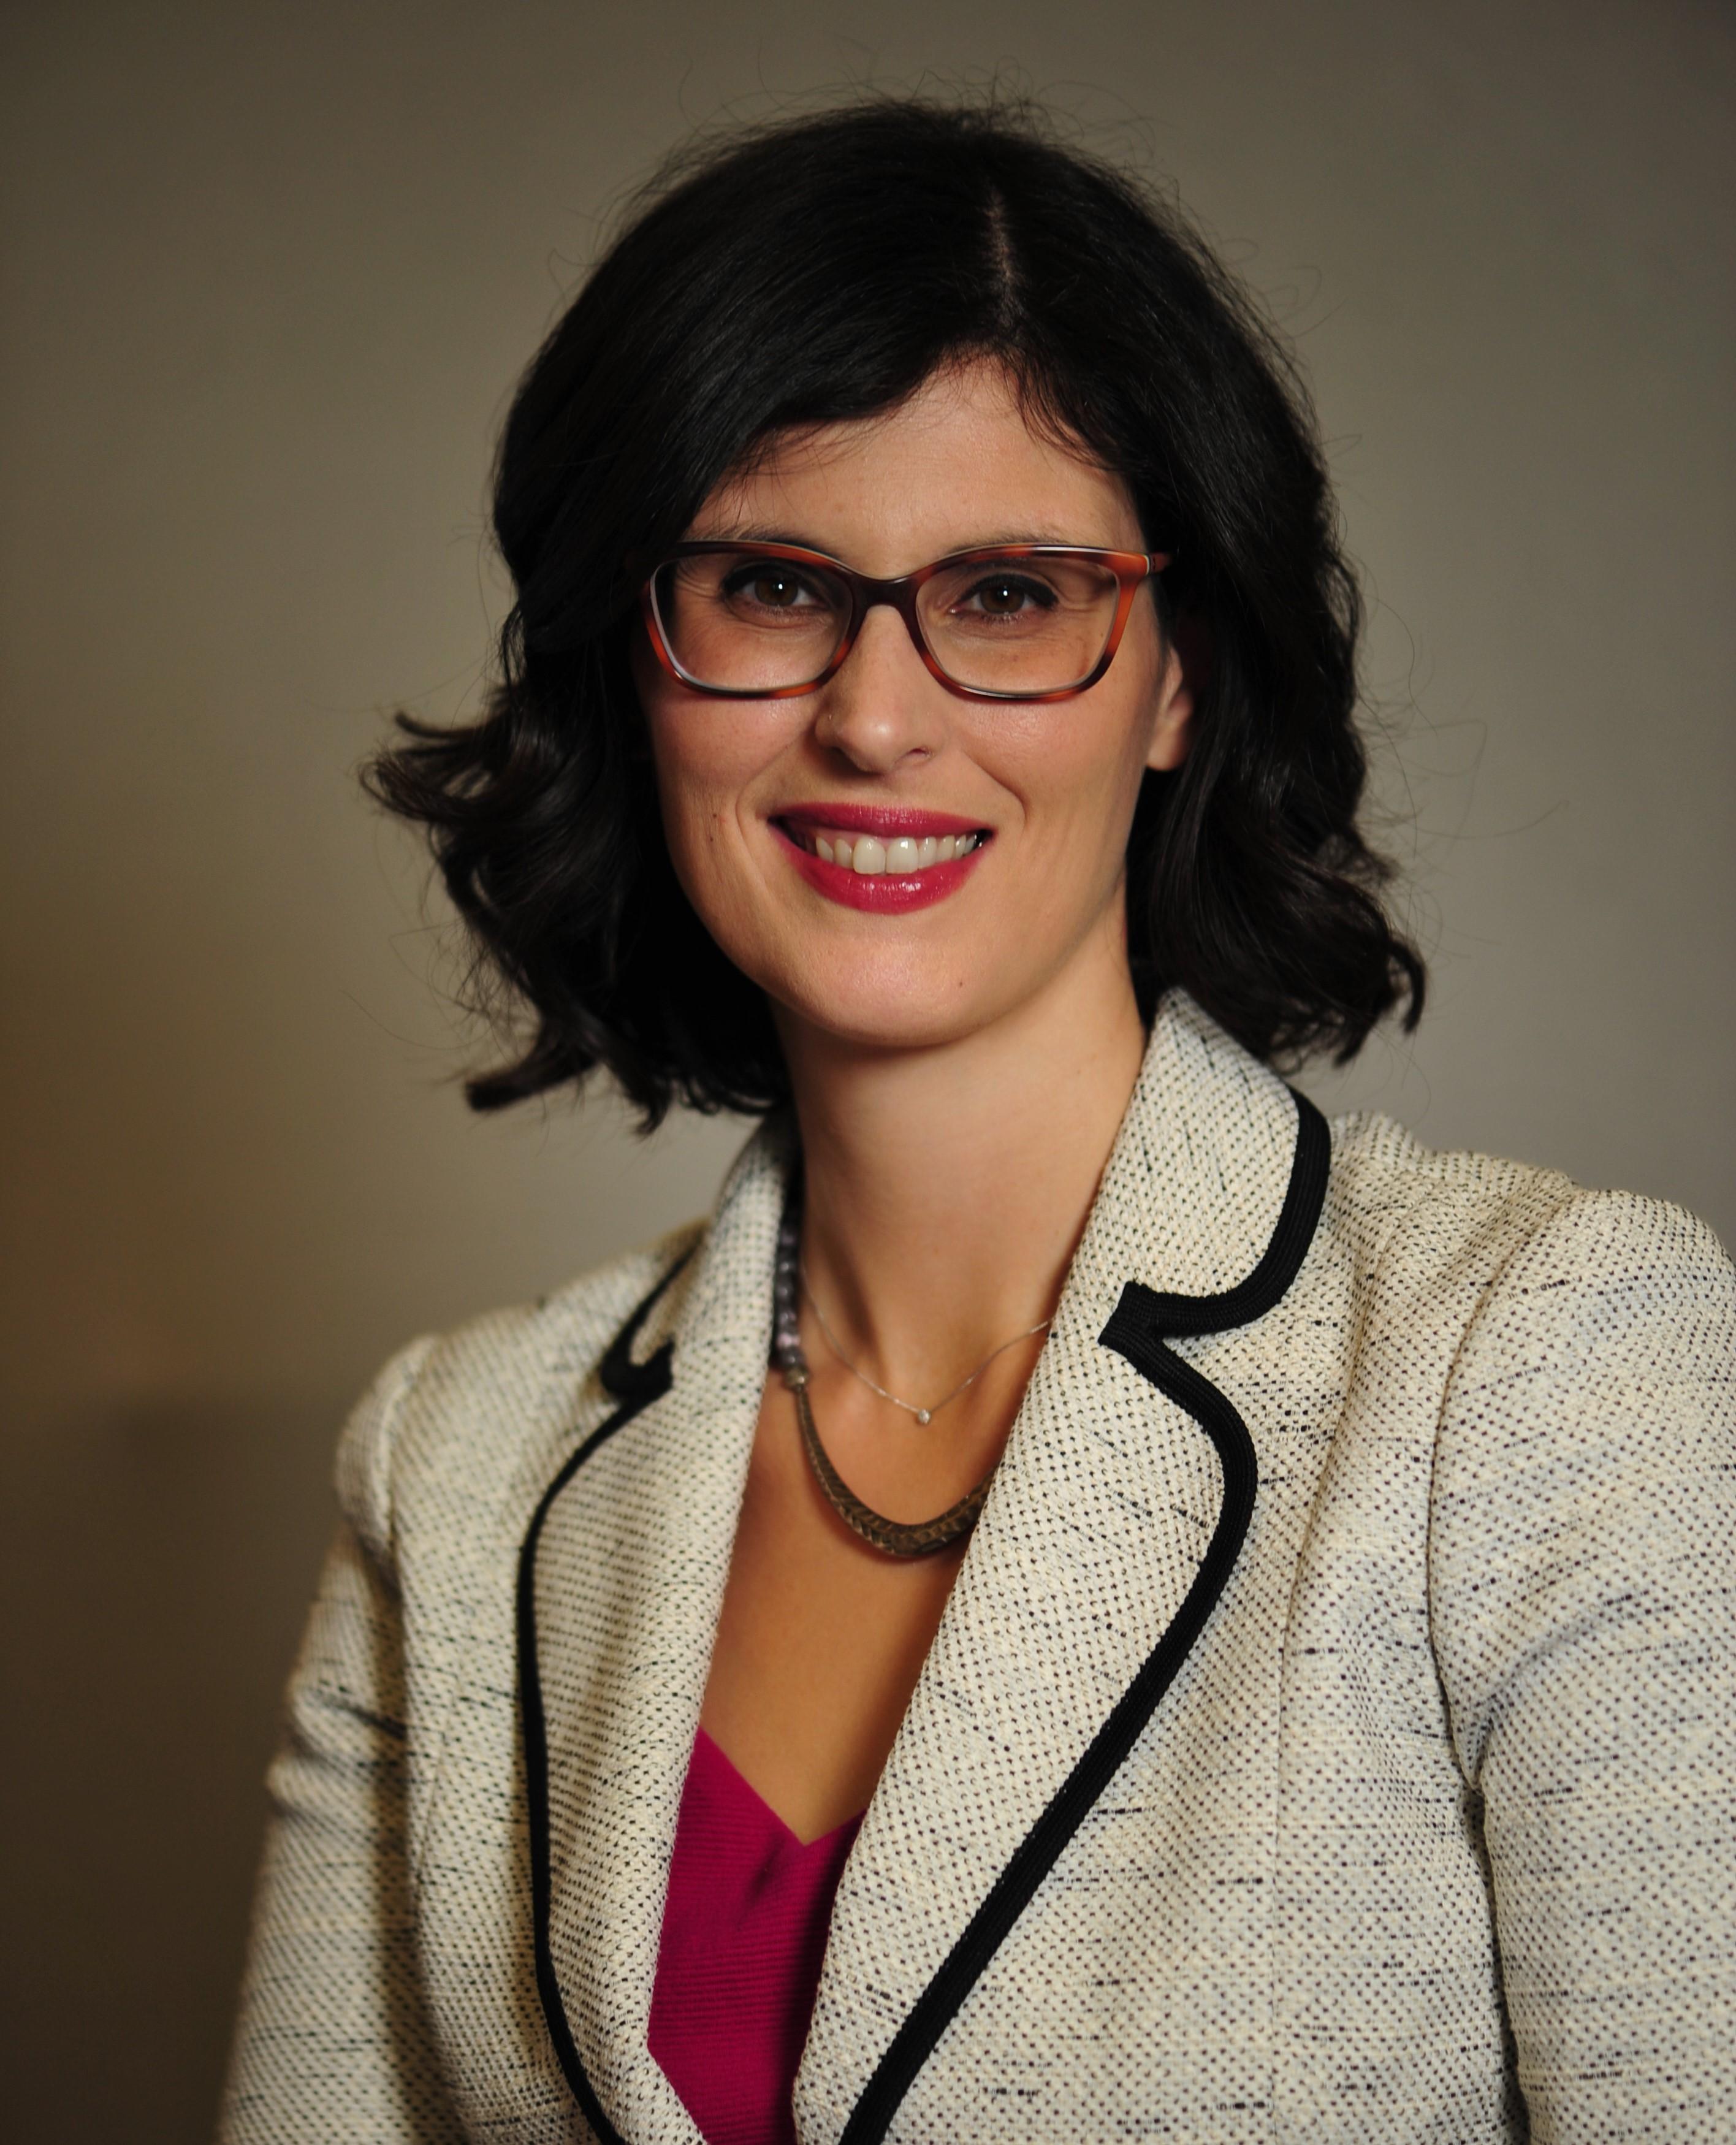 Layla Moran MP